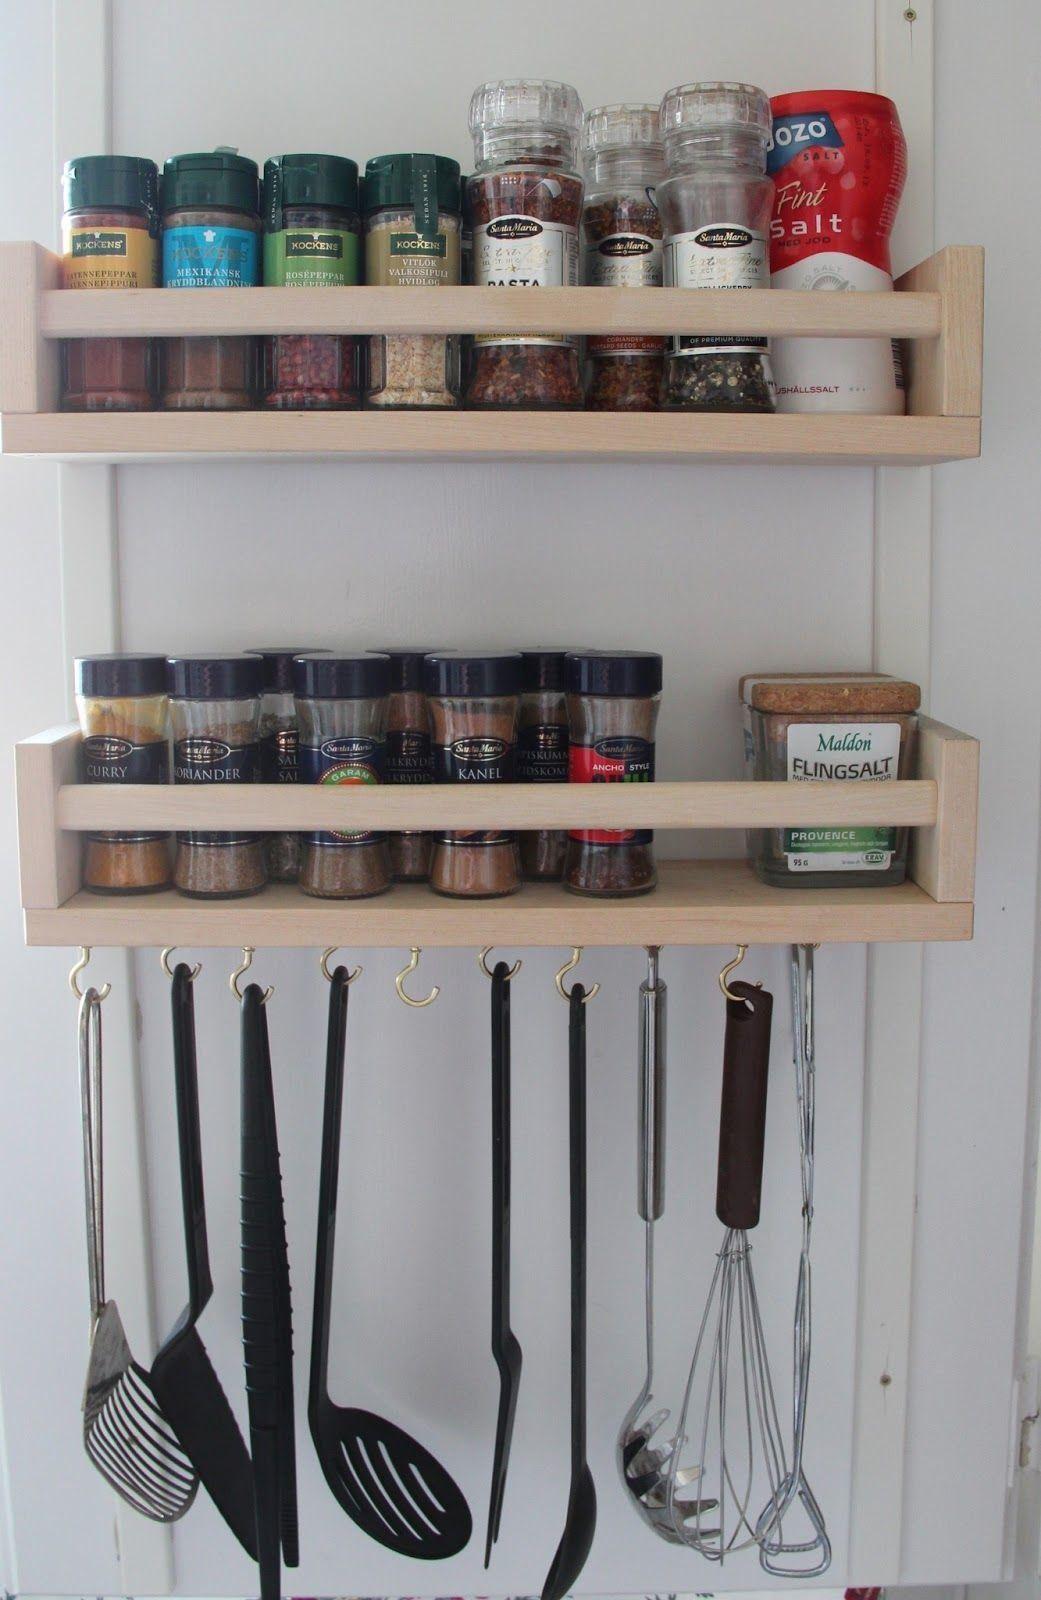 25 Ways To Use Ikea Bekvam Spice Racks At Home Bekvam Spice Rack